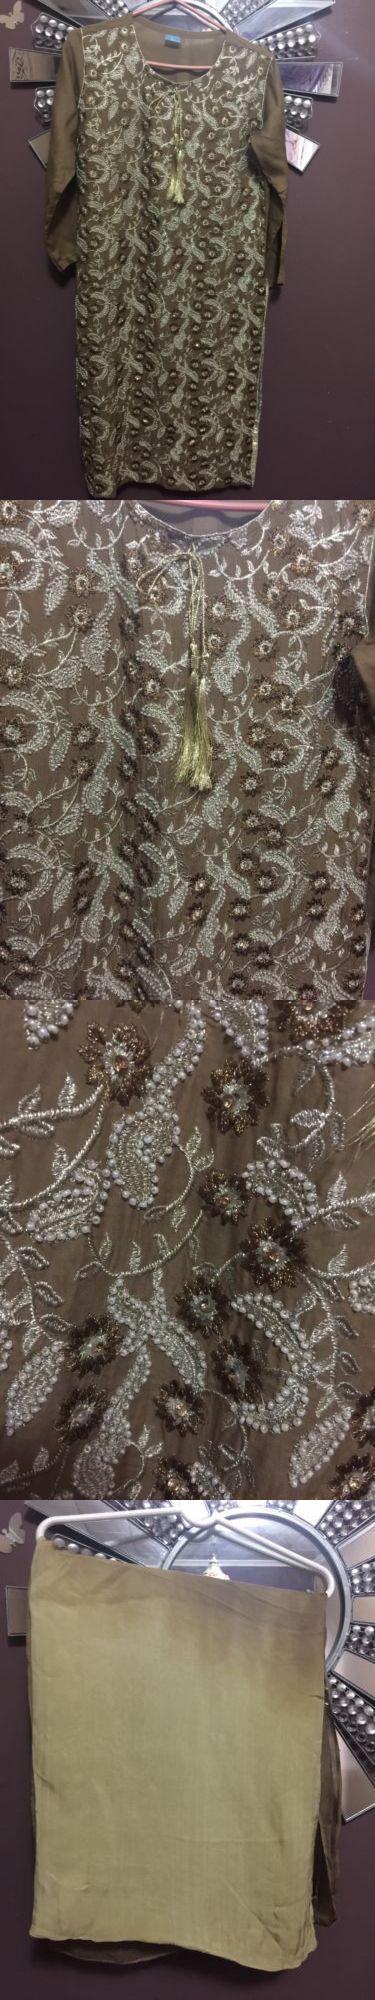 Salwar Kameez 155249: Indian Pakistani Salwar Kameez Anarkali Stitched Party Wear Eid Dress Suit Fancy -> BUY IT NOW ONLY: $45 on eBay!